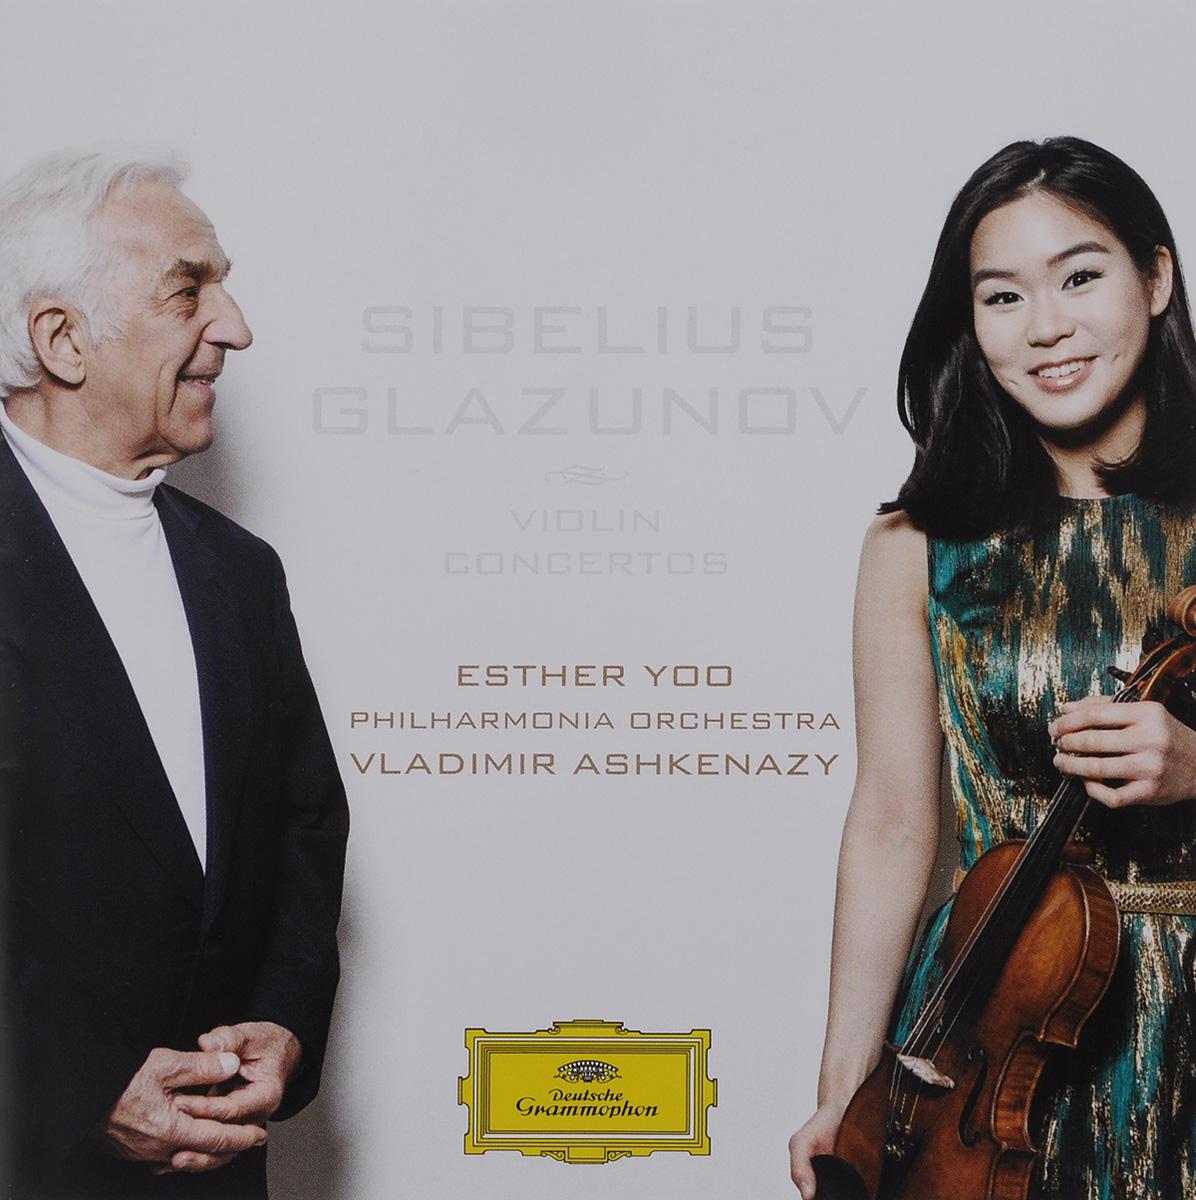 все цены на Владимир Ашкенази,Philharmonia Orchestra,Esther Yoo Vladimir Ashkenazy. Sibelius / Glazunov. Violin Concertos